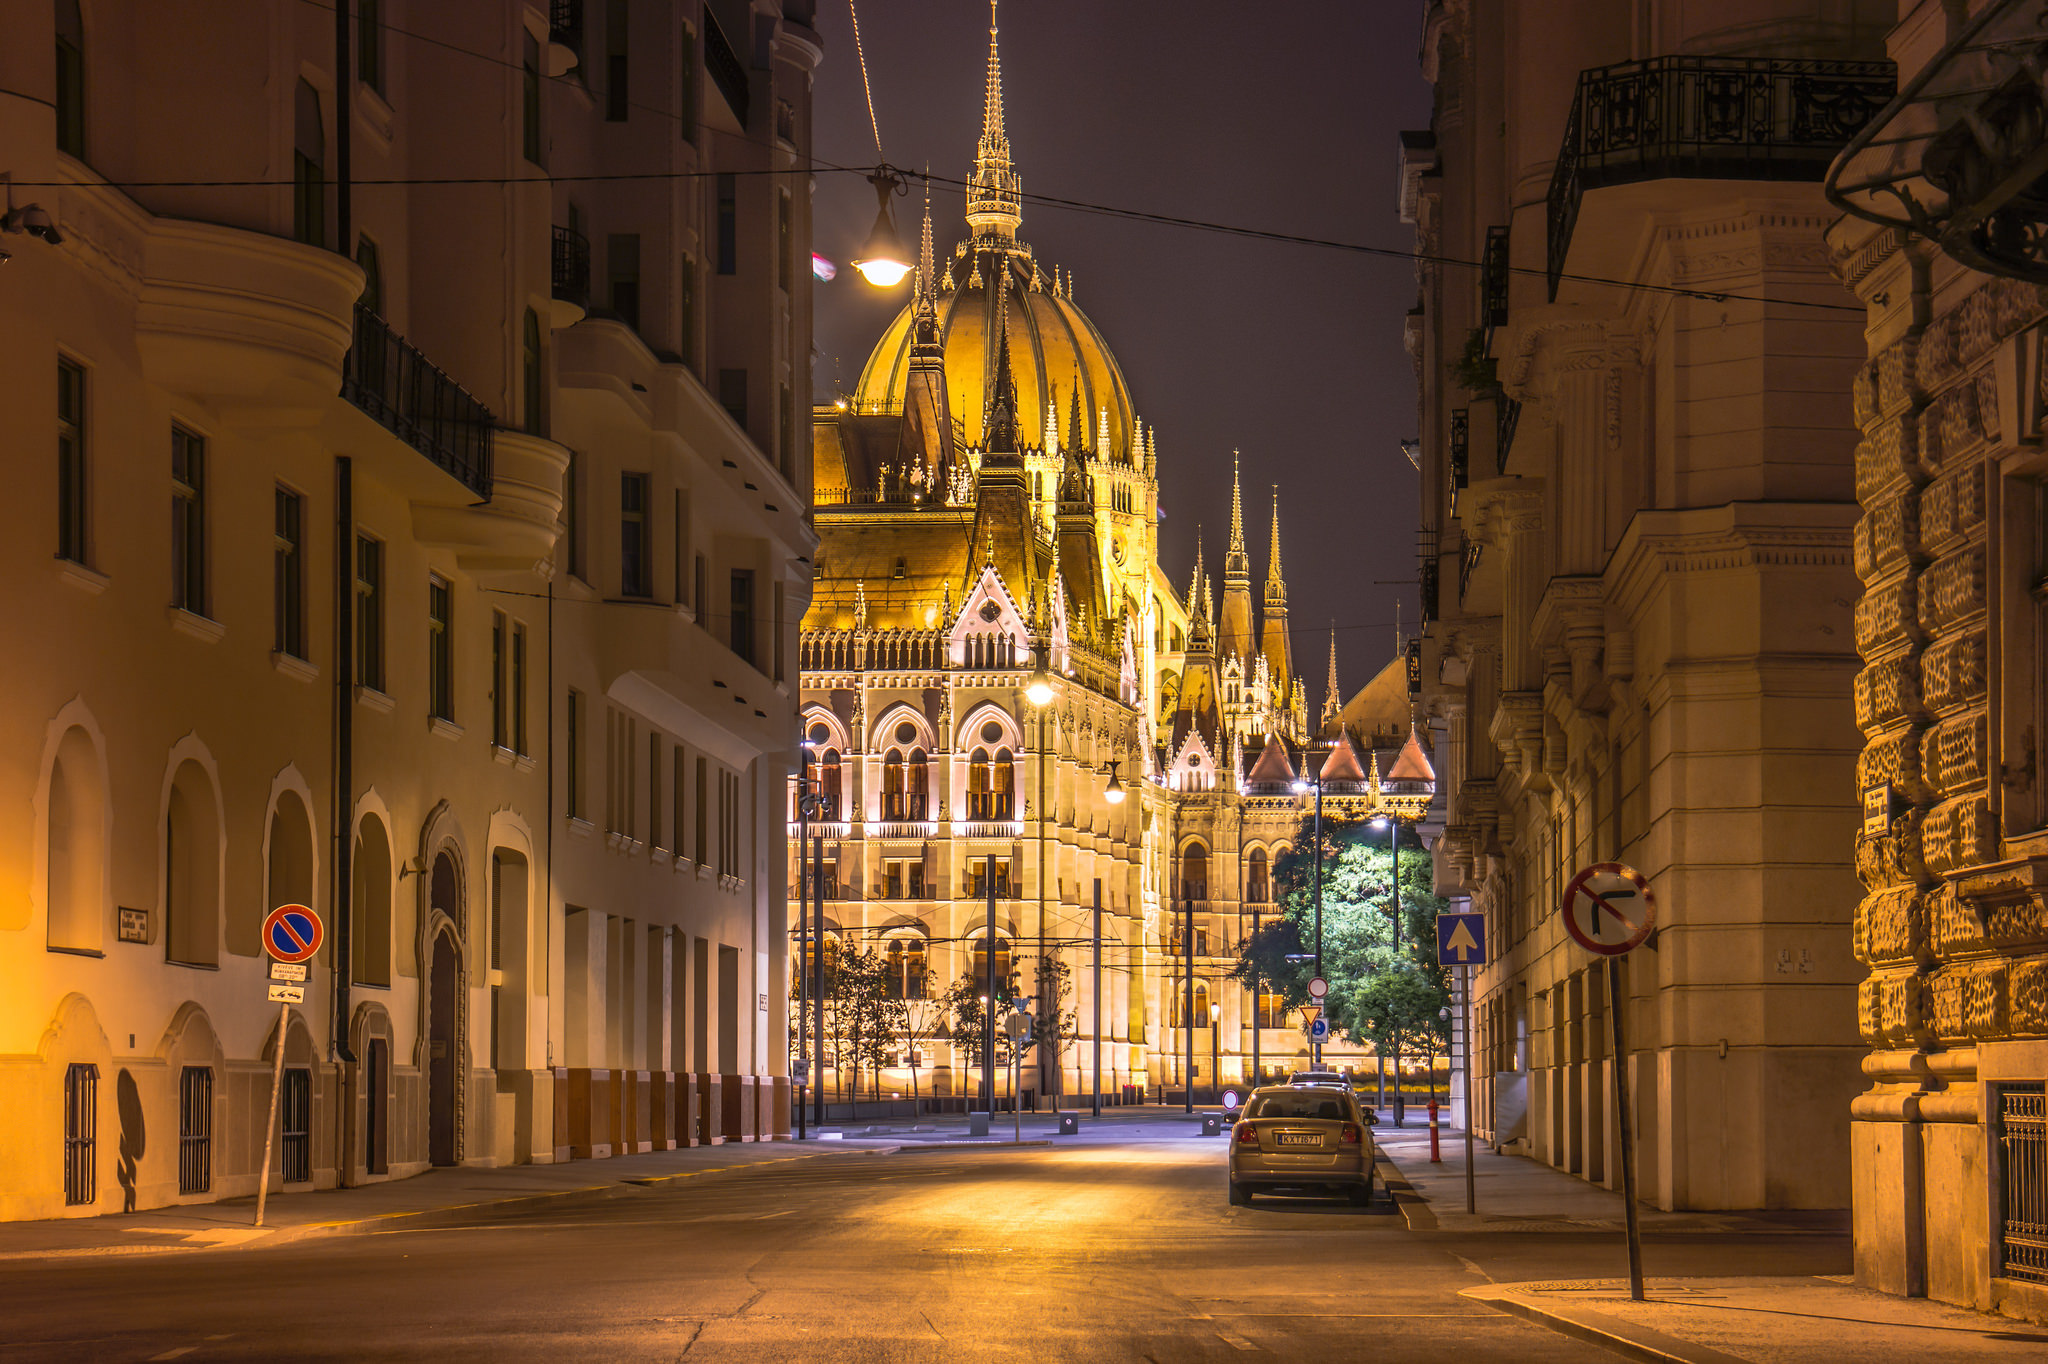 parlament_budapest_magyarorszag.jpg